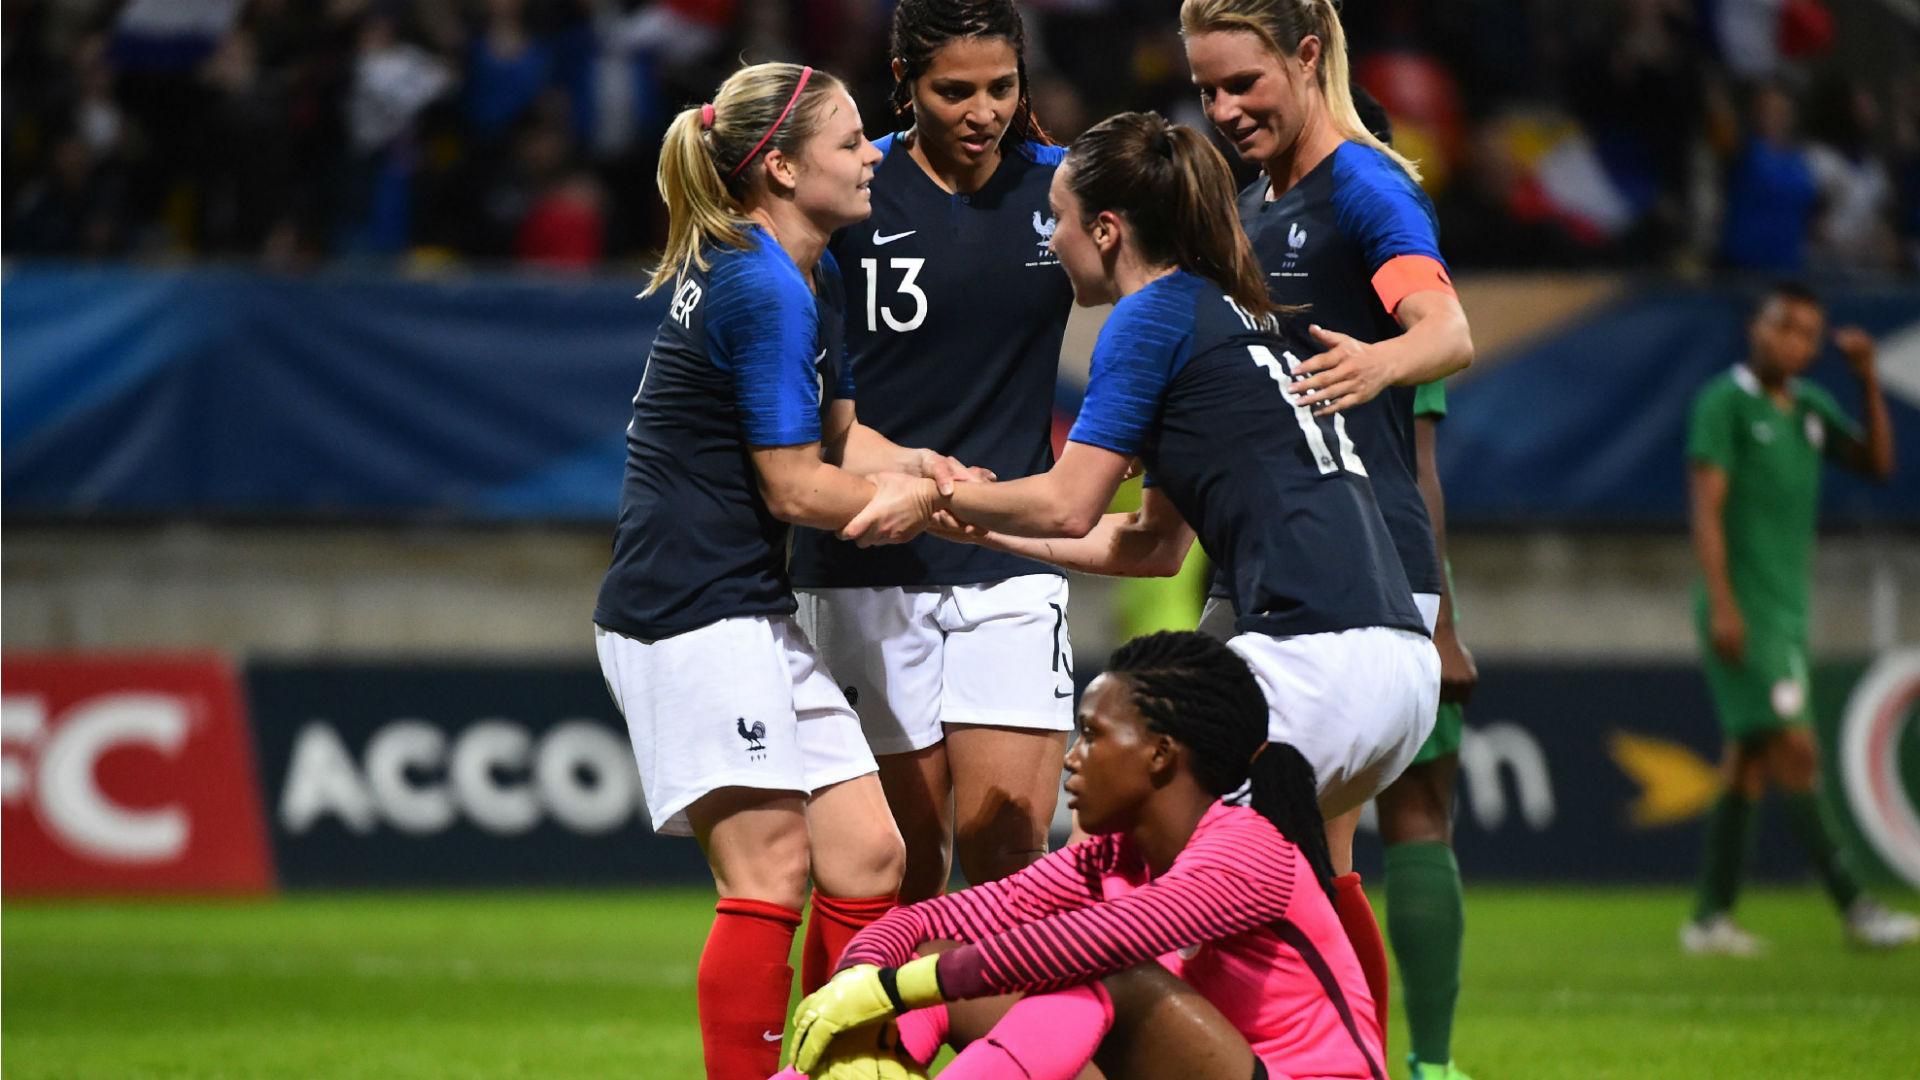 Image result for France Vs Nigeria: Women's Friendly - 8 - 0